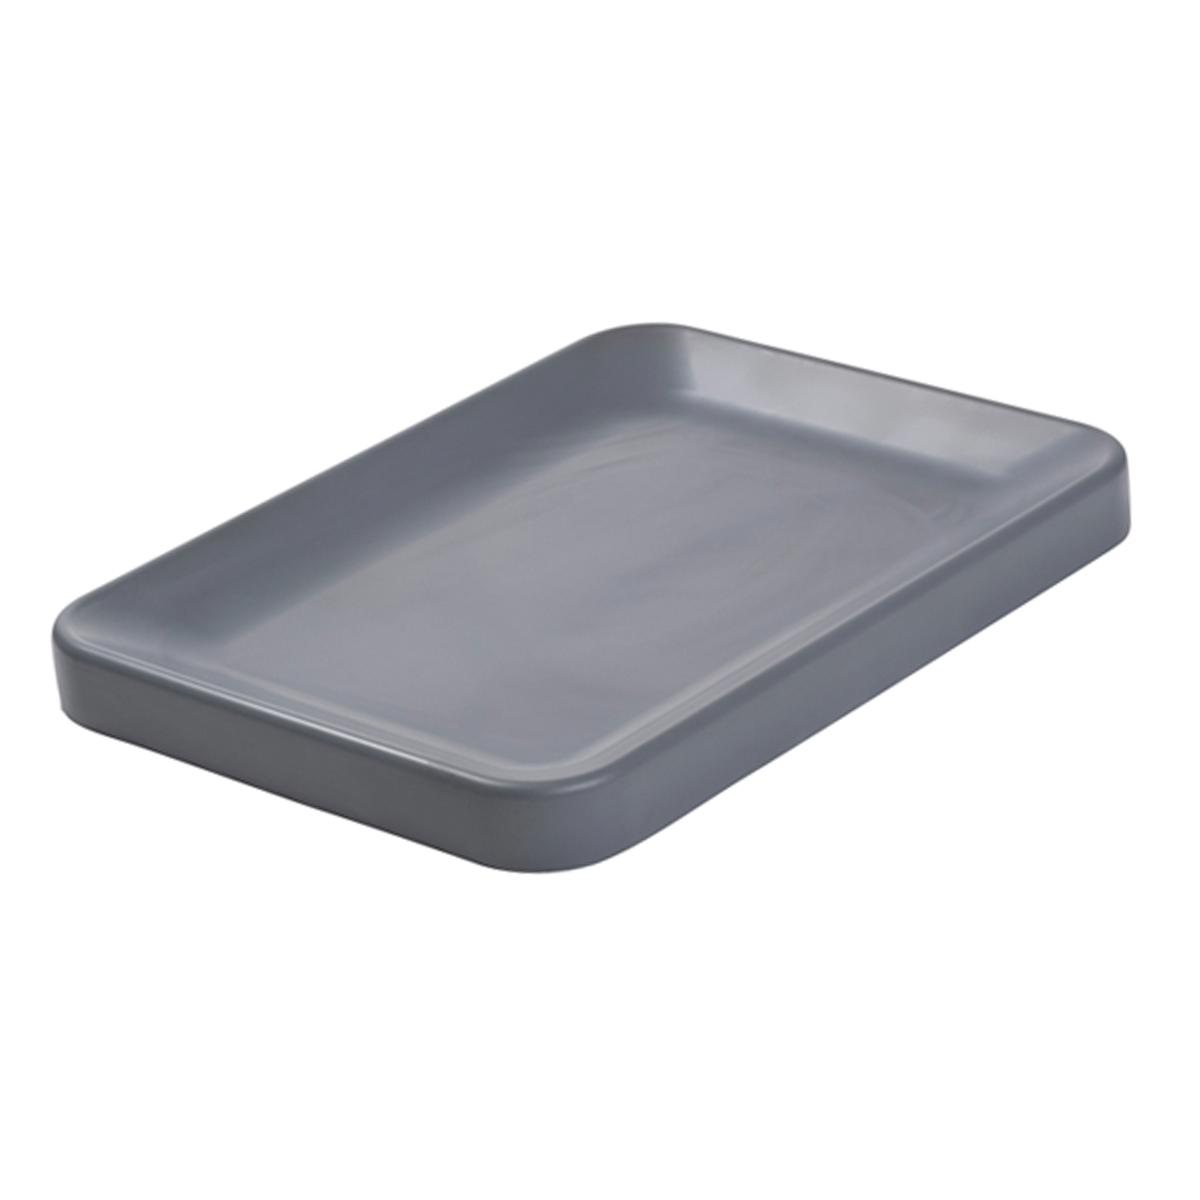 Babytrold - Foam Molded Changing Mat - Grey